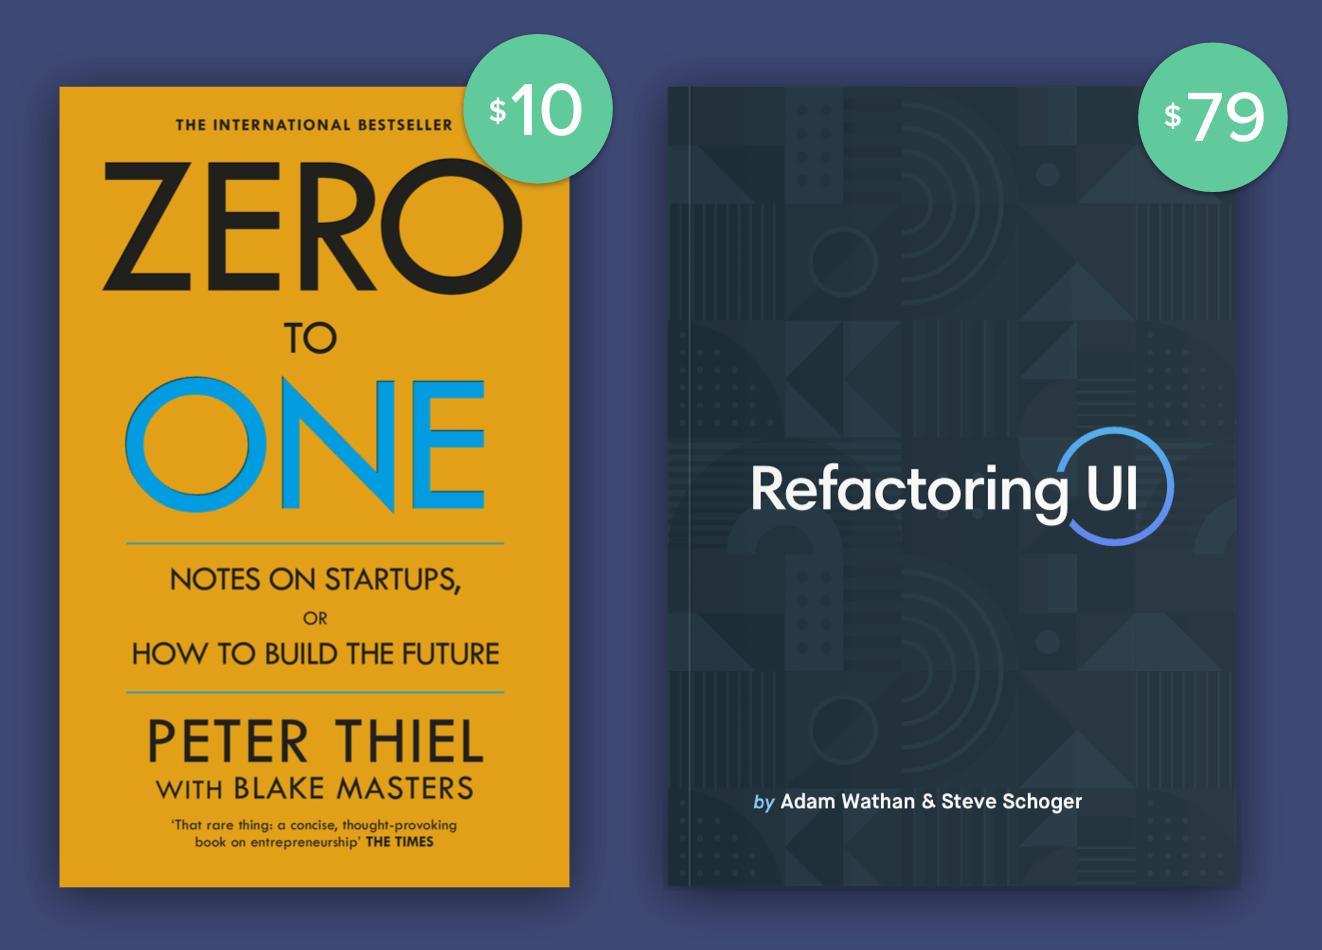 Pieter Thiel Vs Refactoring UI